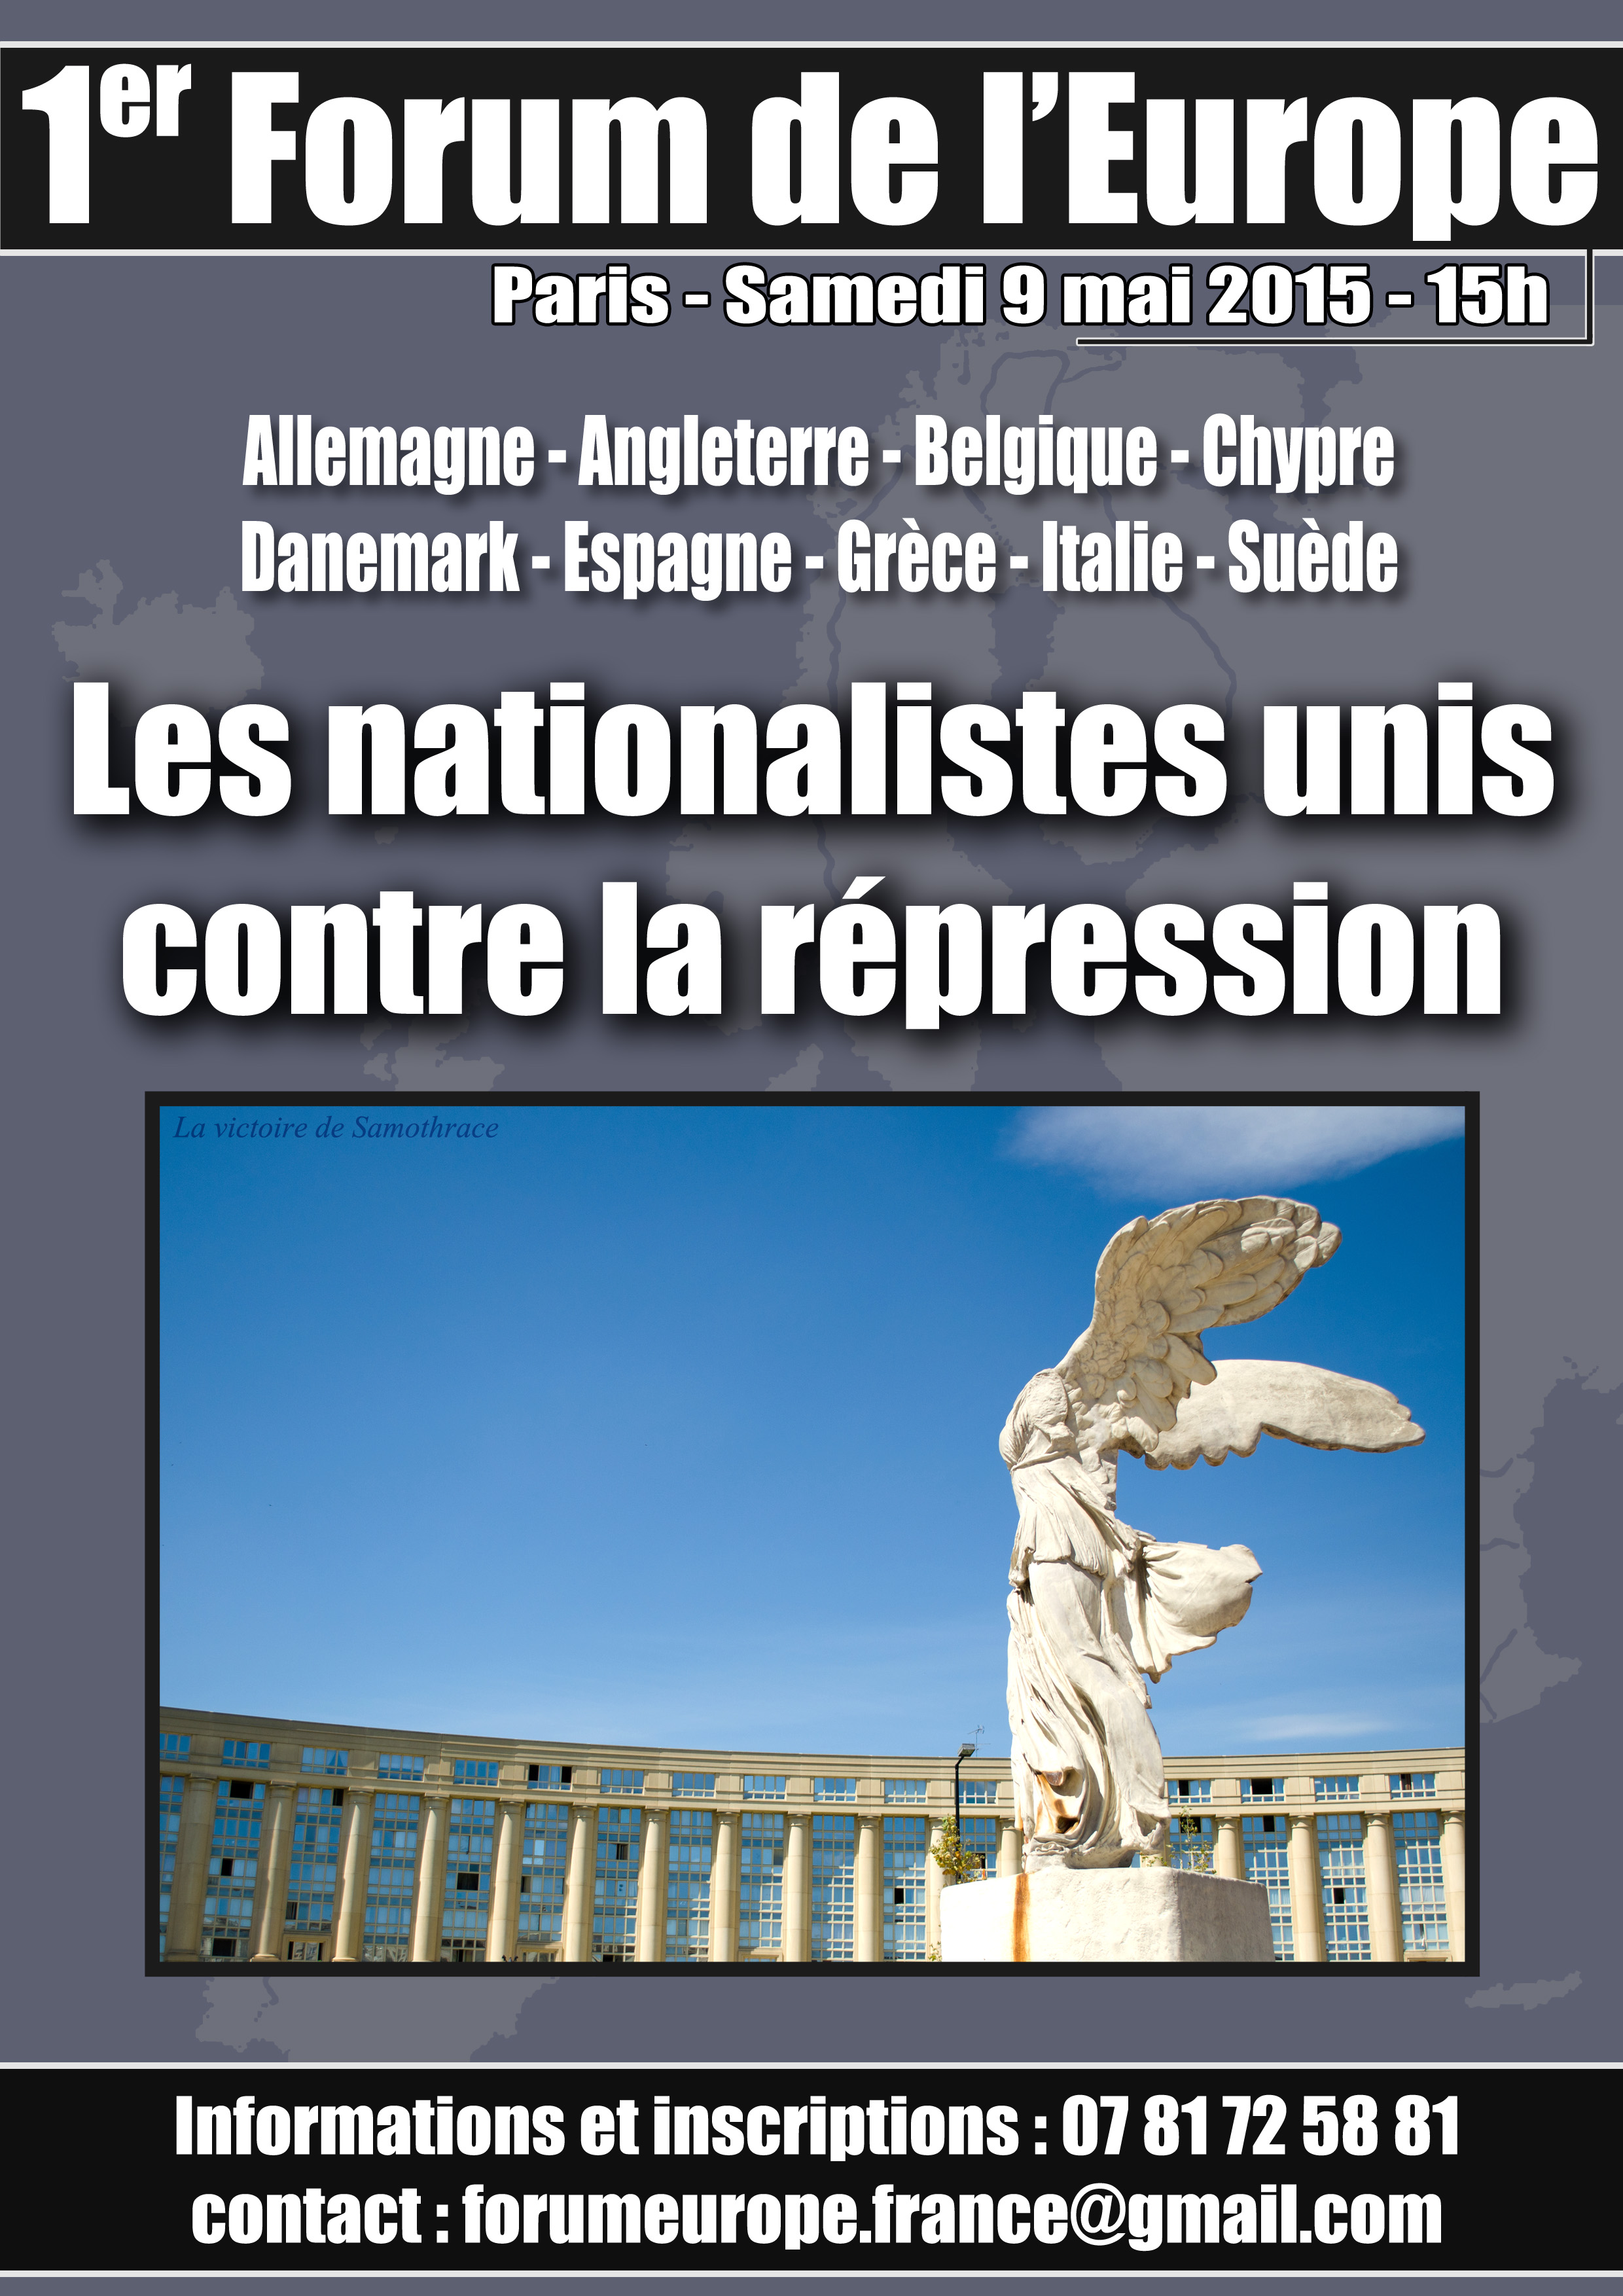 Discurso del Jefe Nacional de La Falange en el 1er Foro de Europa